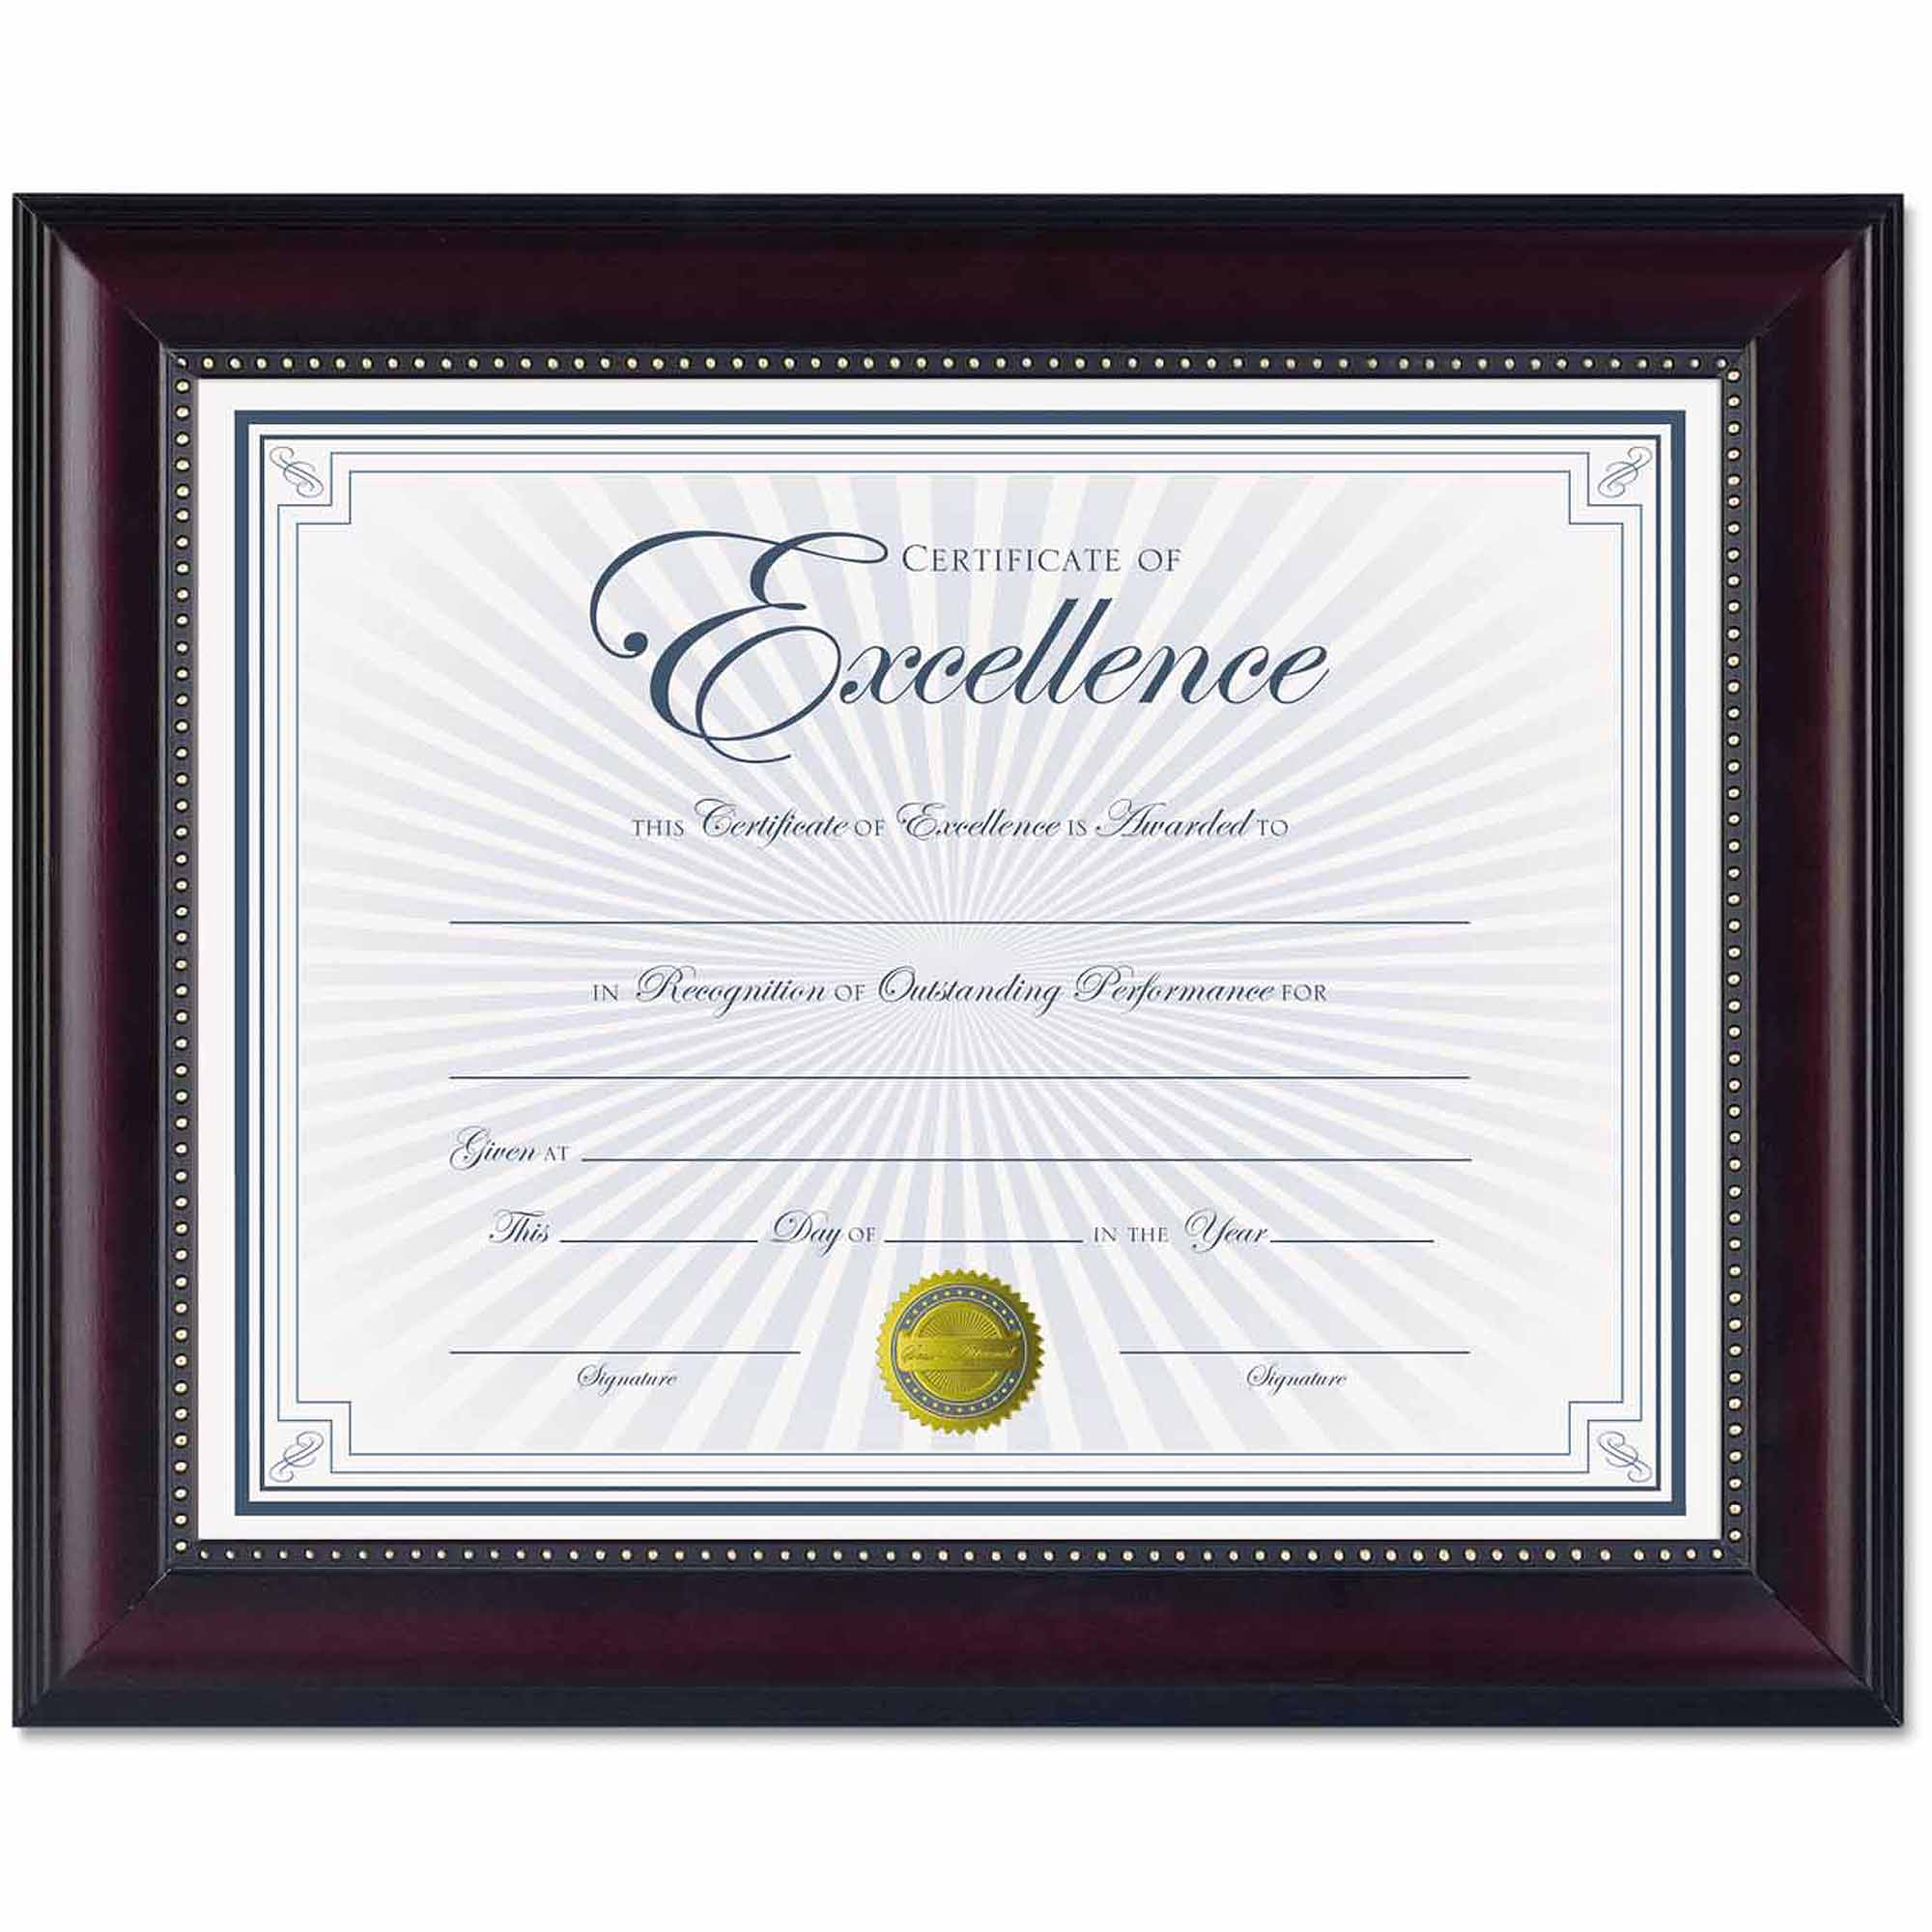 "DAX Prestige Document Frame, Rosewood/Black, Gold Accents, Certificate, 8-1/2"" x 11"""